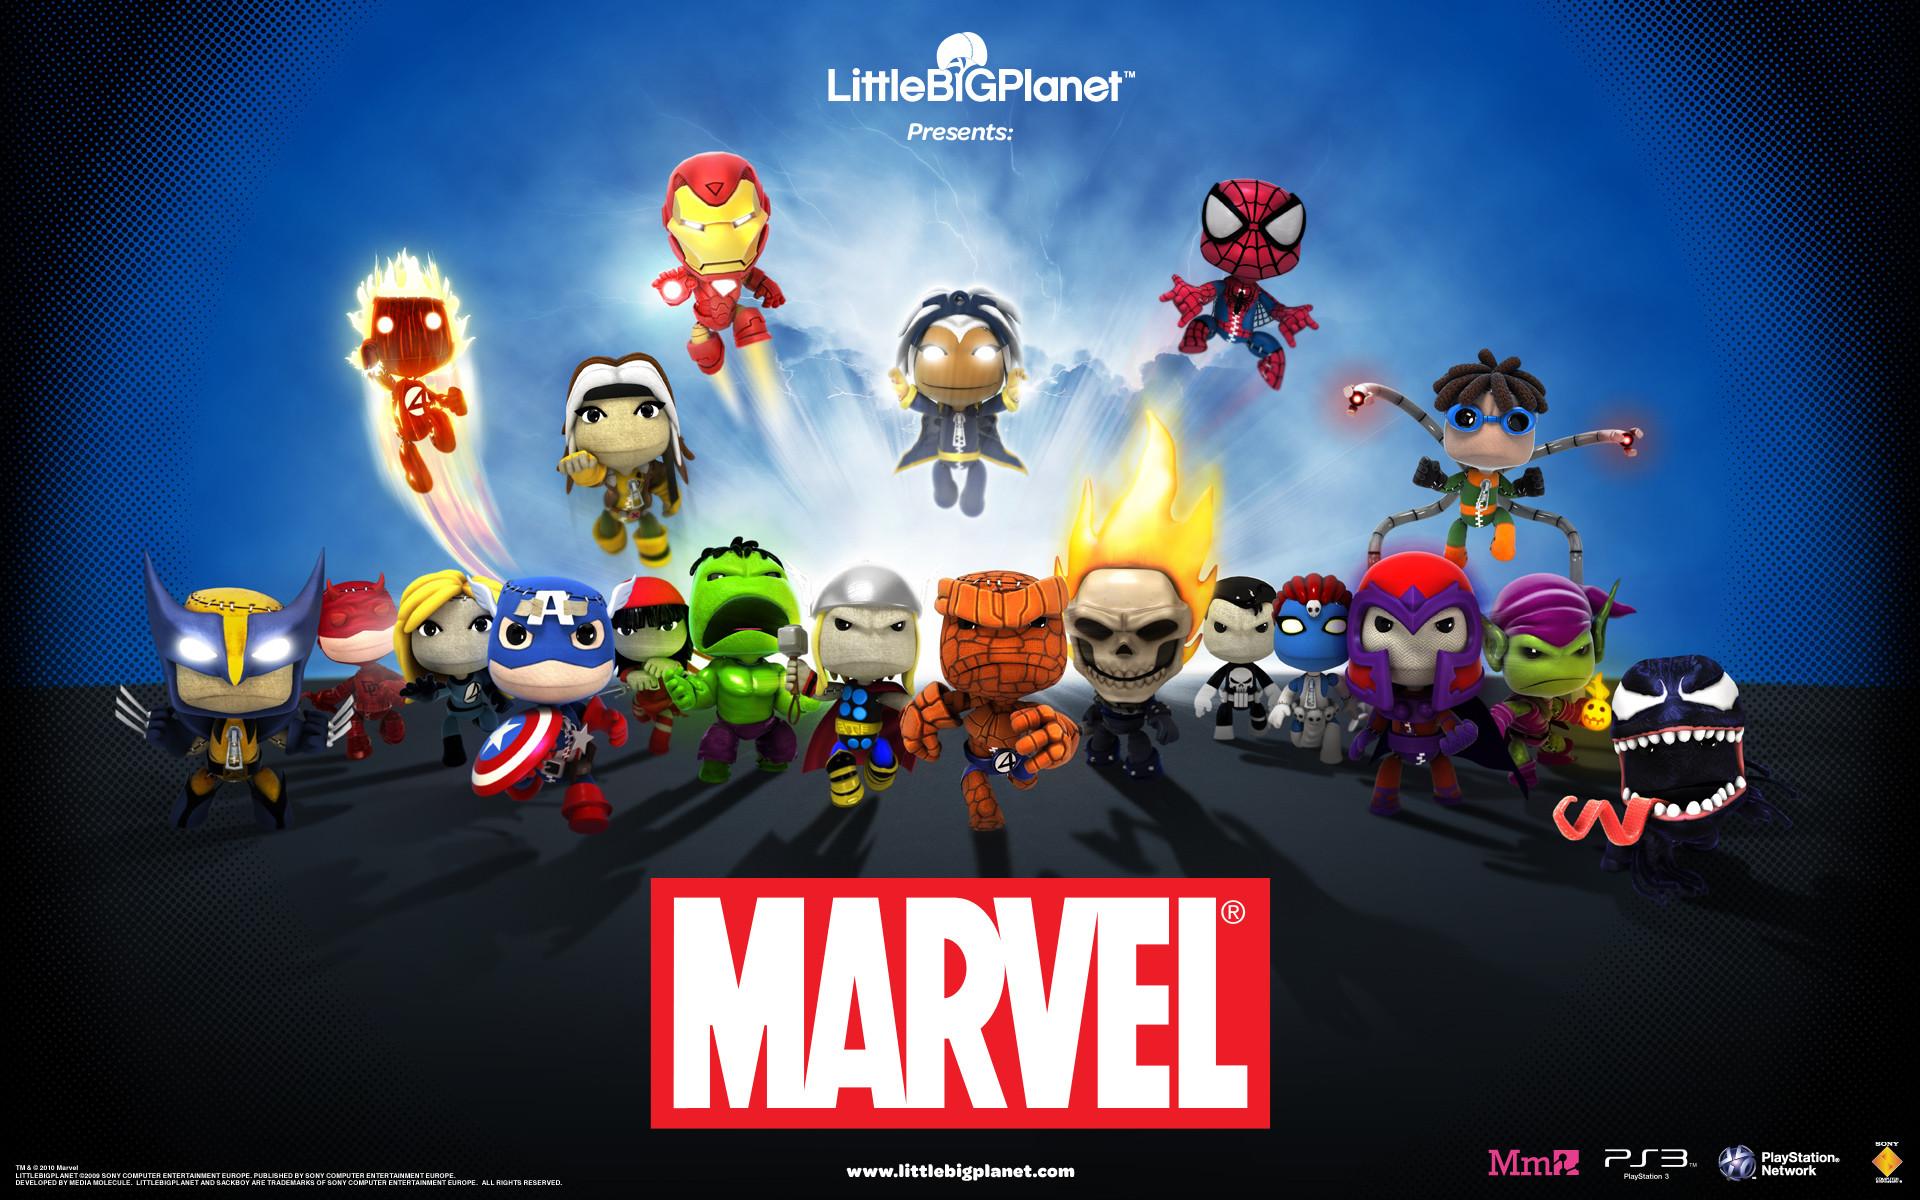 LittleBigPlanet Marvel Wallpaper